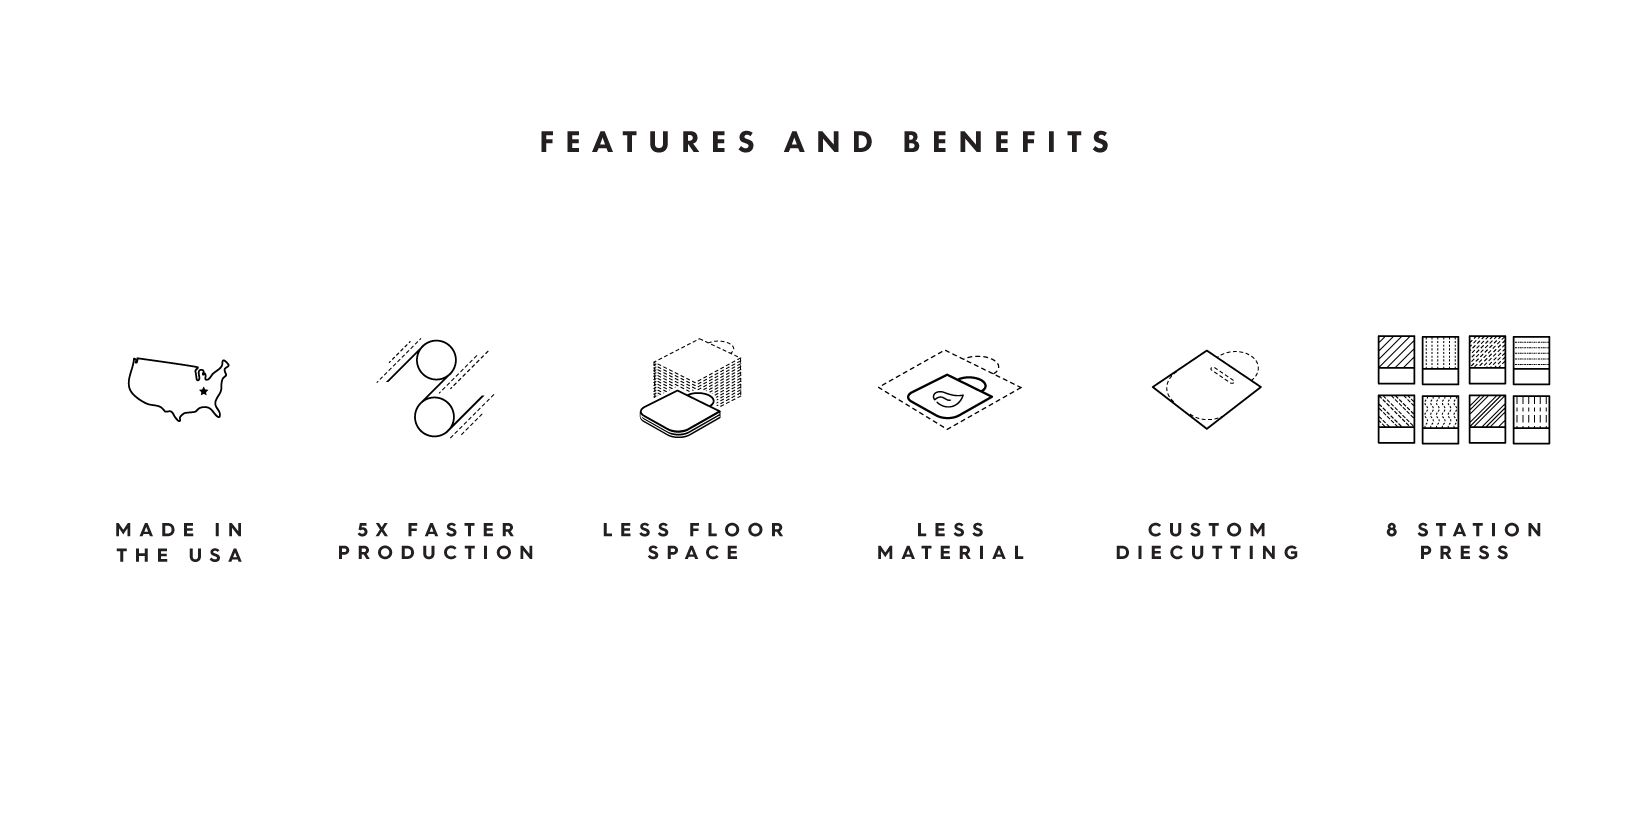 Creative_Retail_Packaging_Paper_Bag_Blog_22.jpg